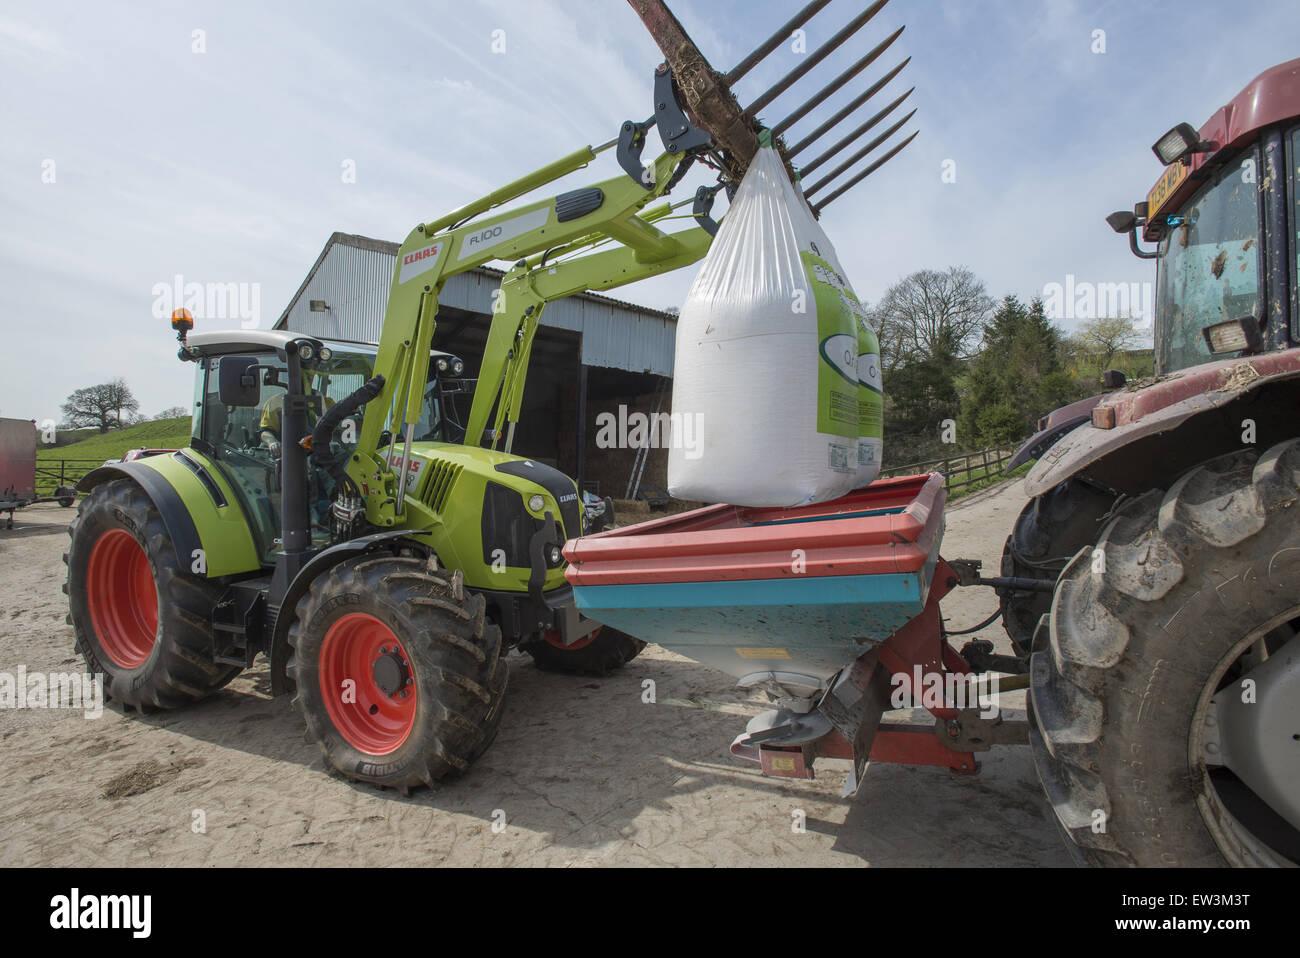 claas traktor mit frontlader gabeln big bags von d nger in d ngerstreuer auf bauernhof in der. Black Bedroom Furniture Sets. Home Design Ideas